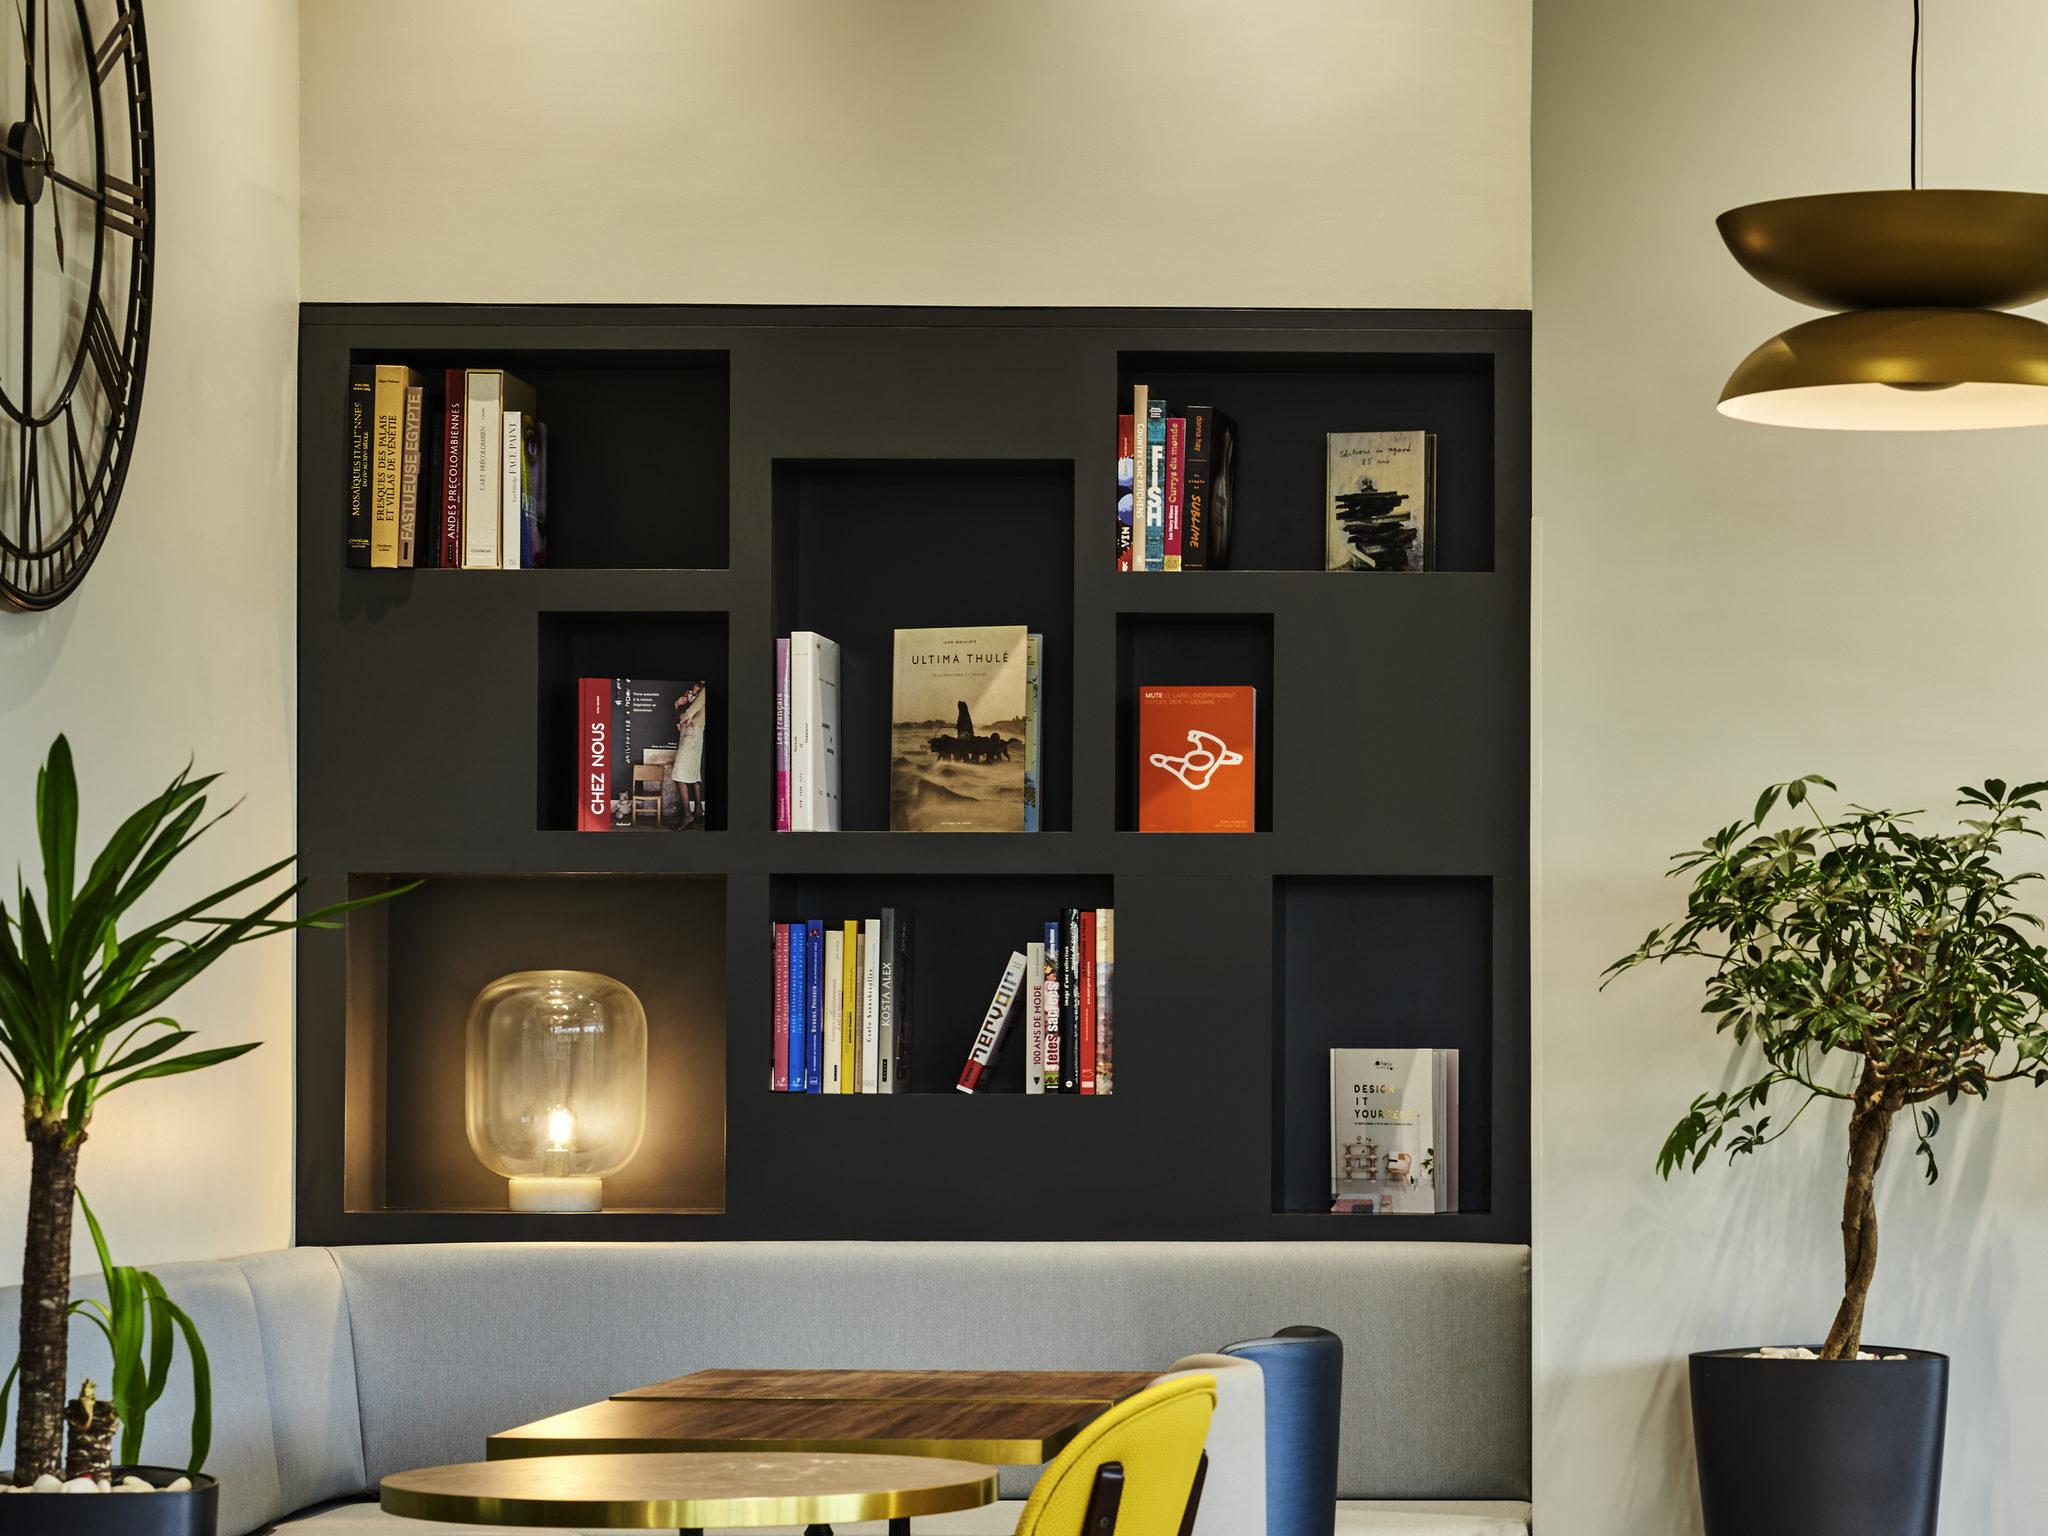 http rencontres adultes 85 rencontre adulte yveliens rencontre adulte. Black Bedroom Furniture Sets. Home Design Ideas